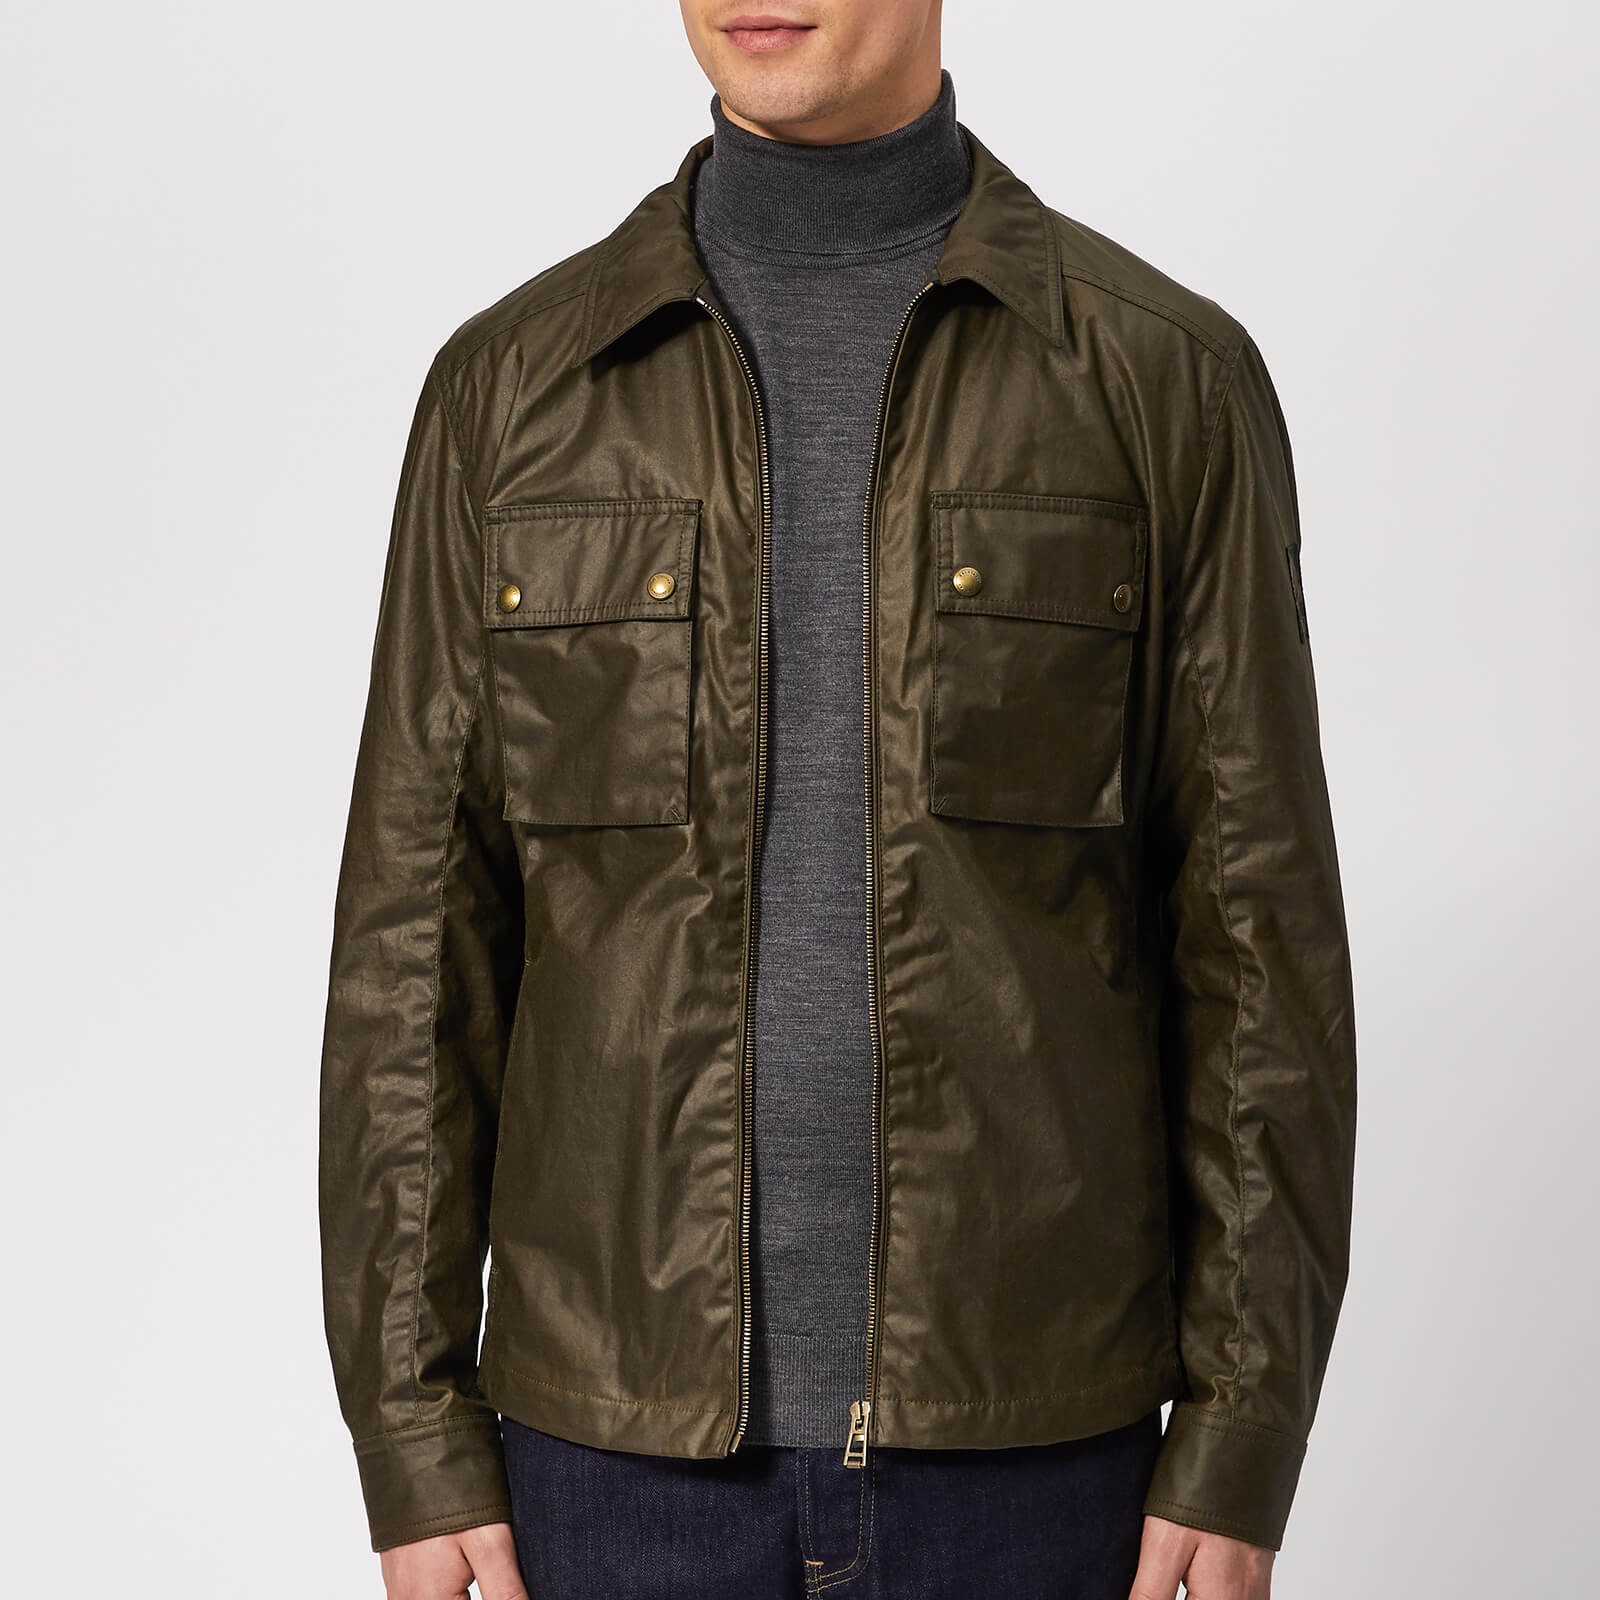 77998e95e7 Belstaff Men's Dunstall Jacket - Faded Olive - Free UK Delivery over £50